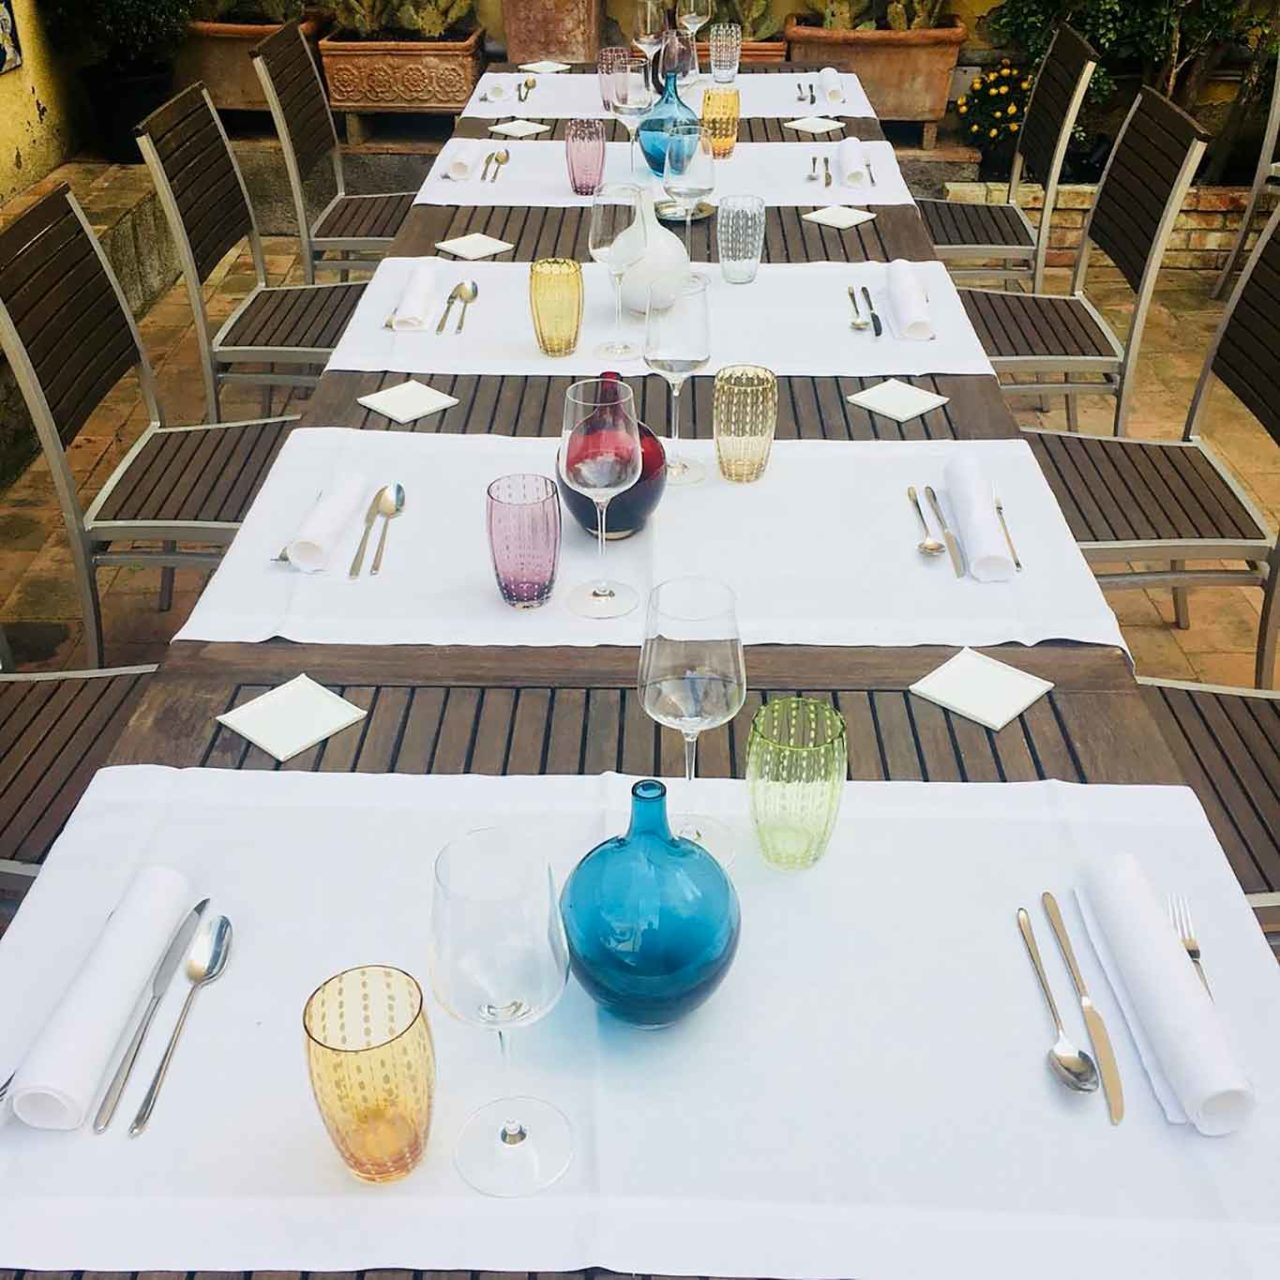 Kisté easy gourmet Taormina terrazza